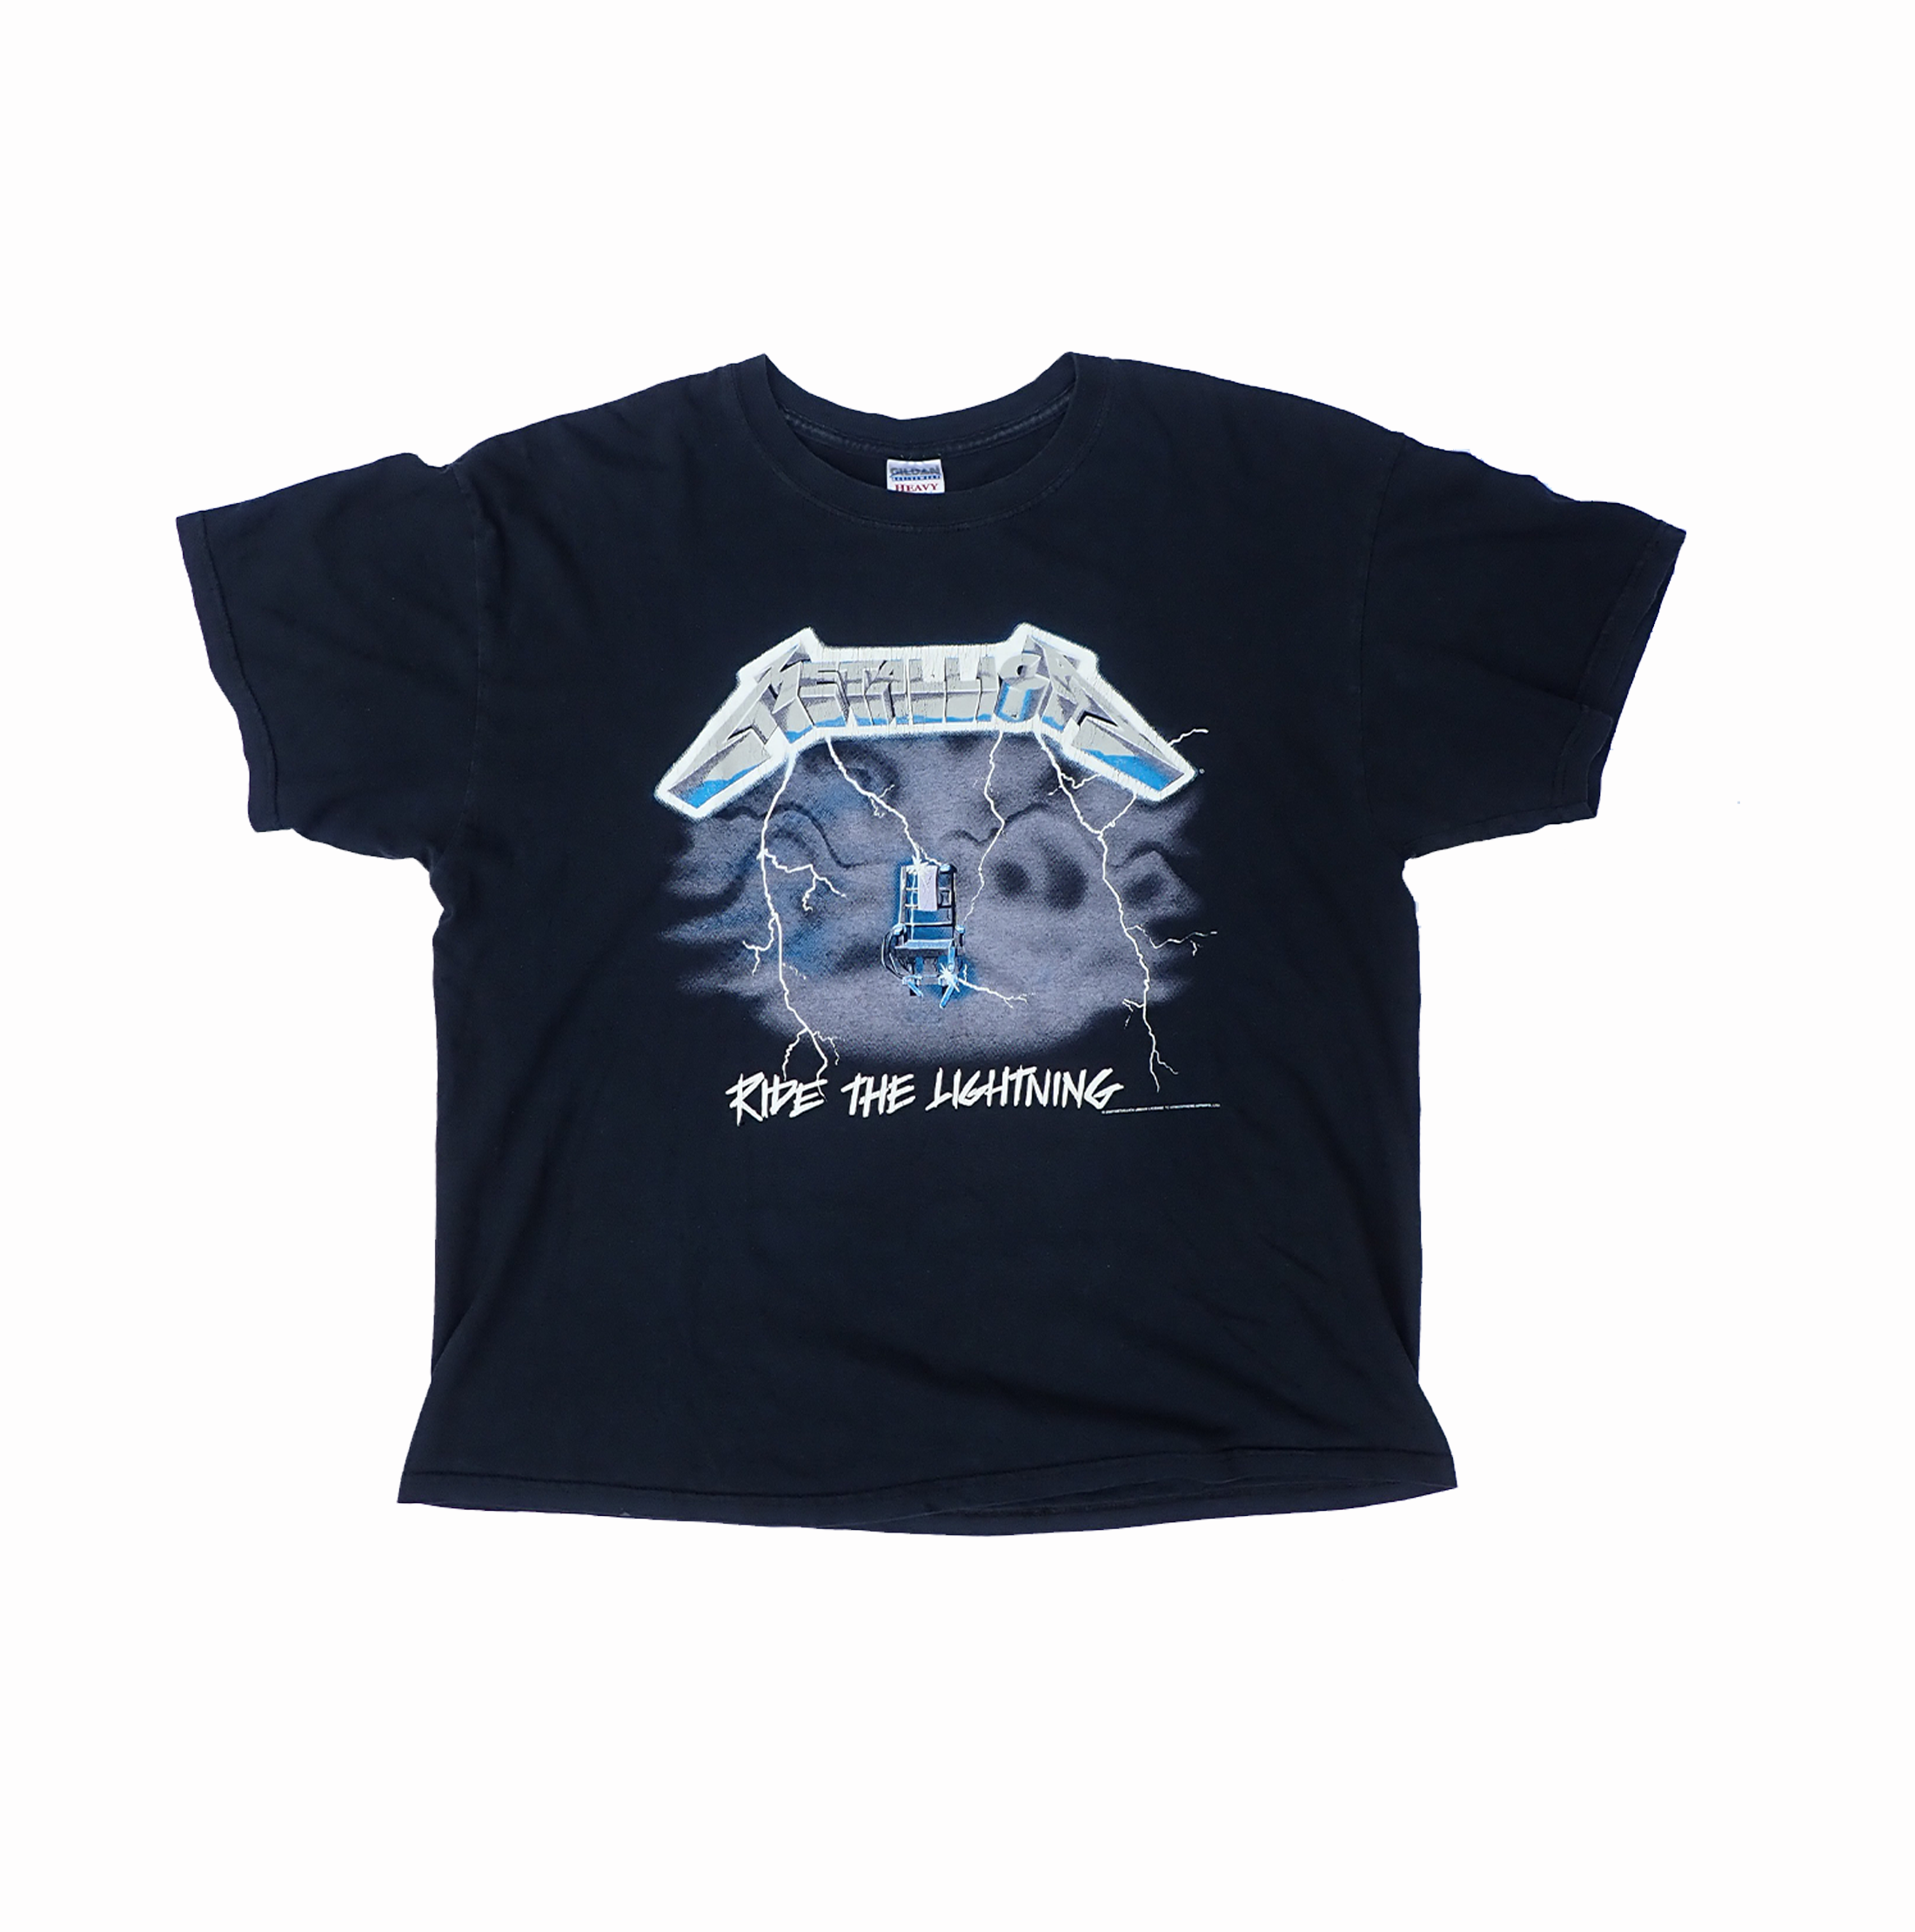 Metallica 2007 Ride the Lightning Tshirt